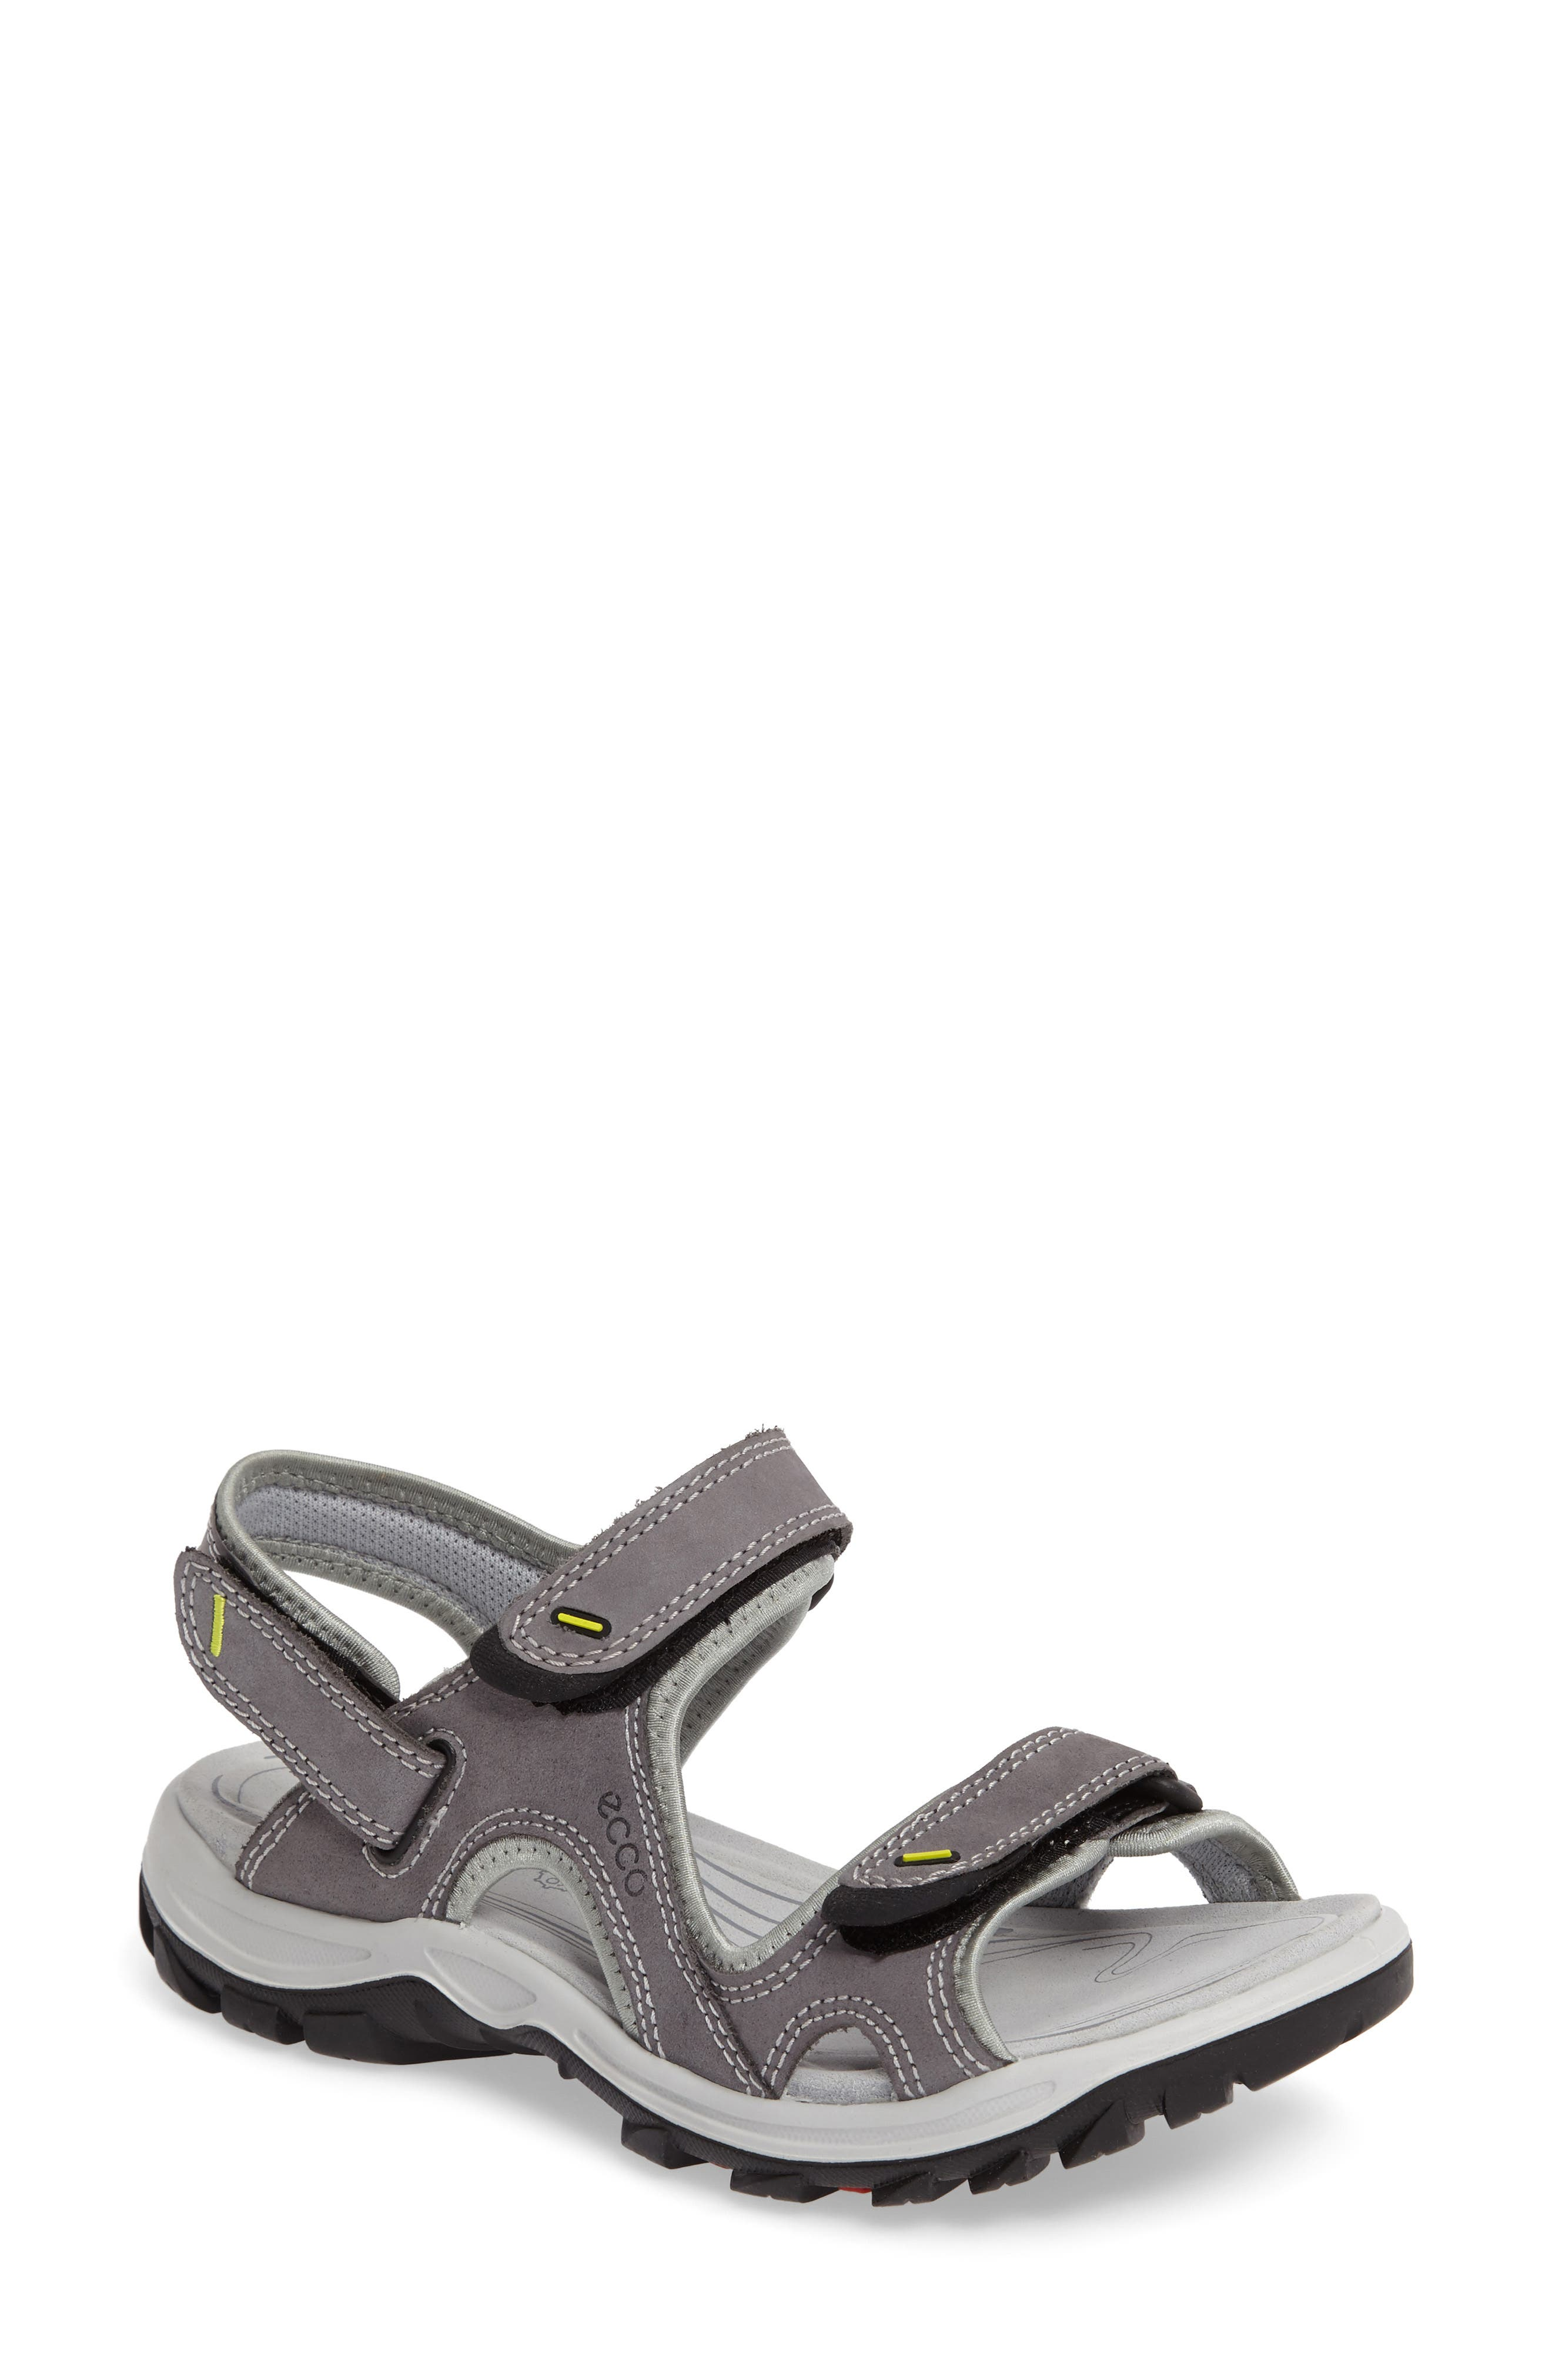 ECCO 'Offroad' Lightweight Sandal